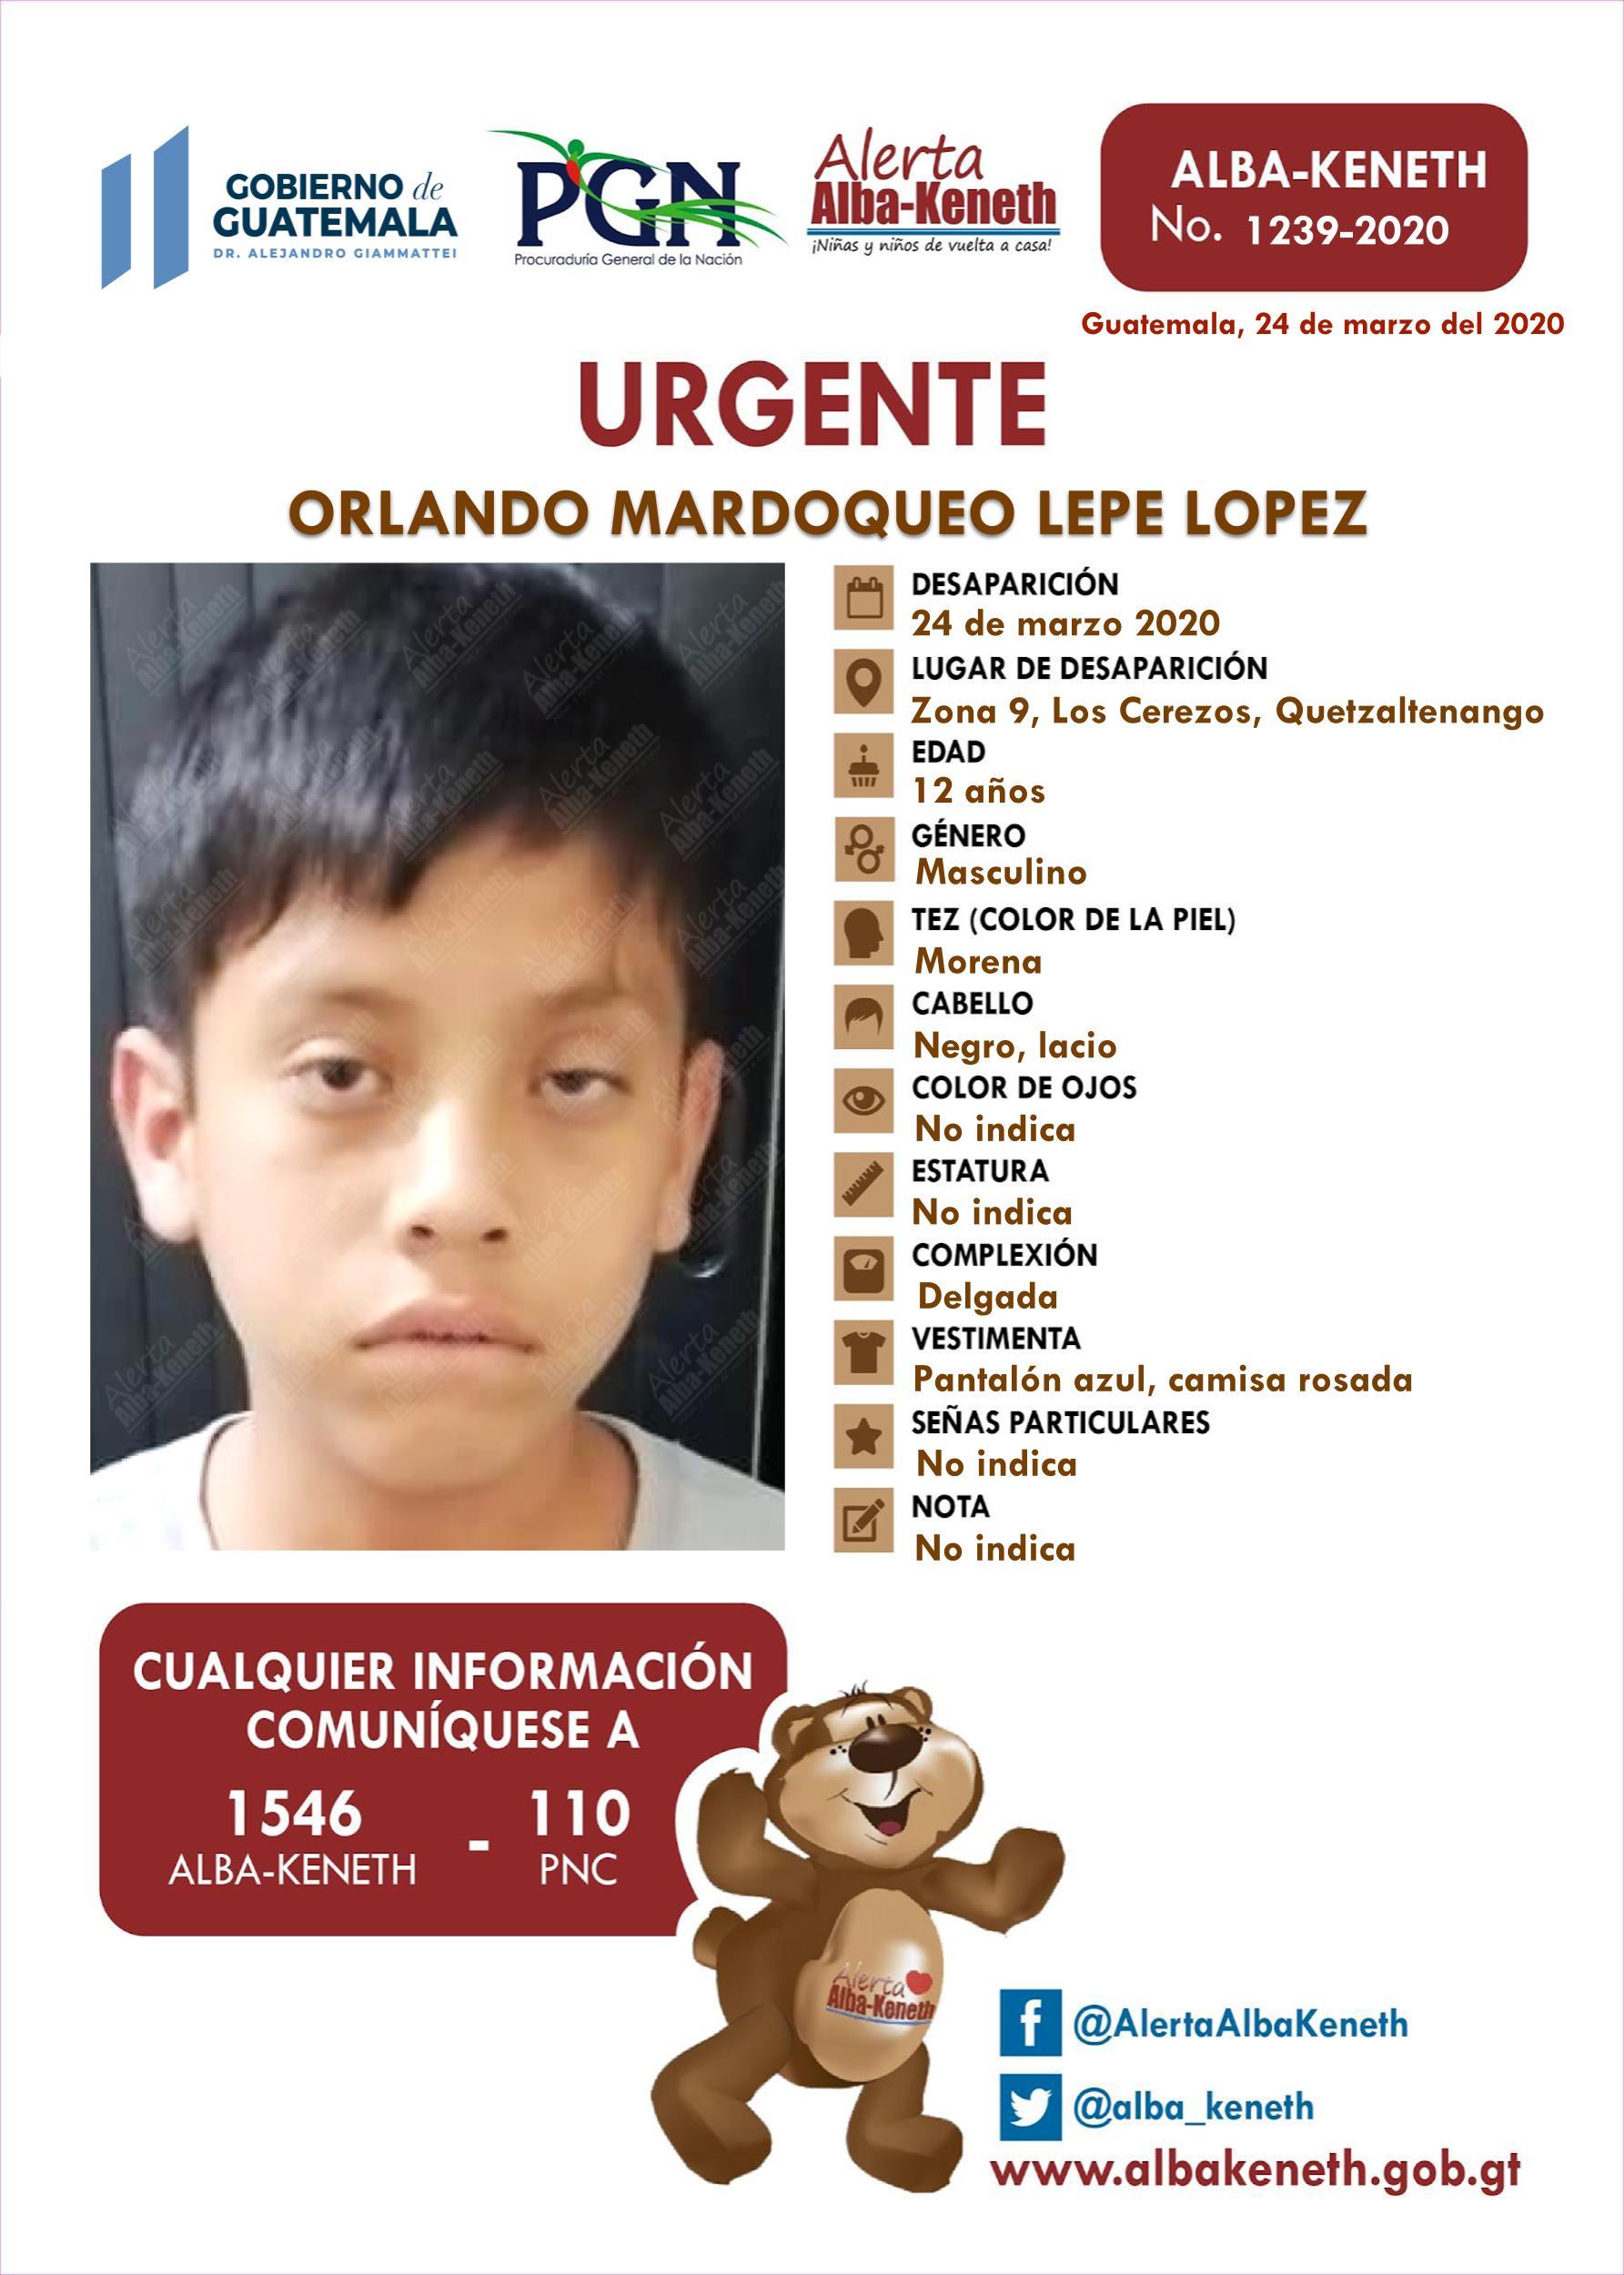 Orlando Mardoqueo Lepe Lopez